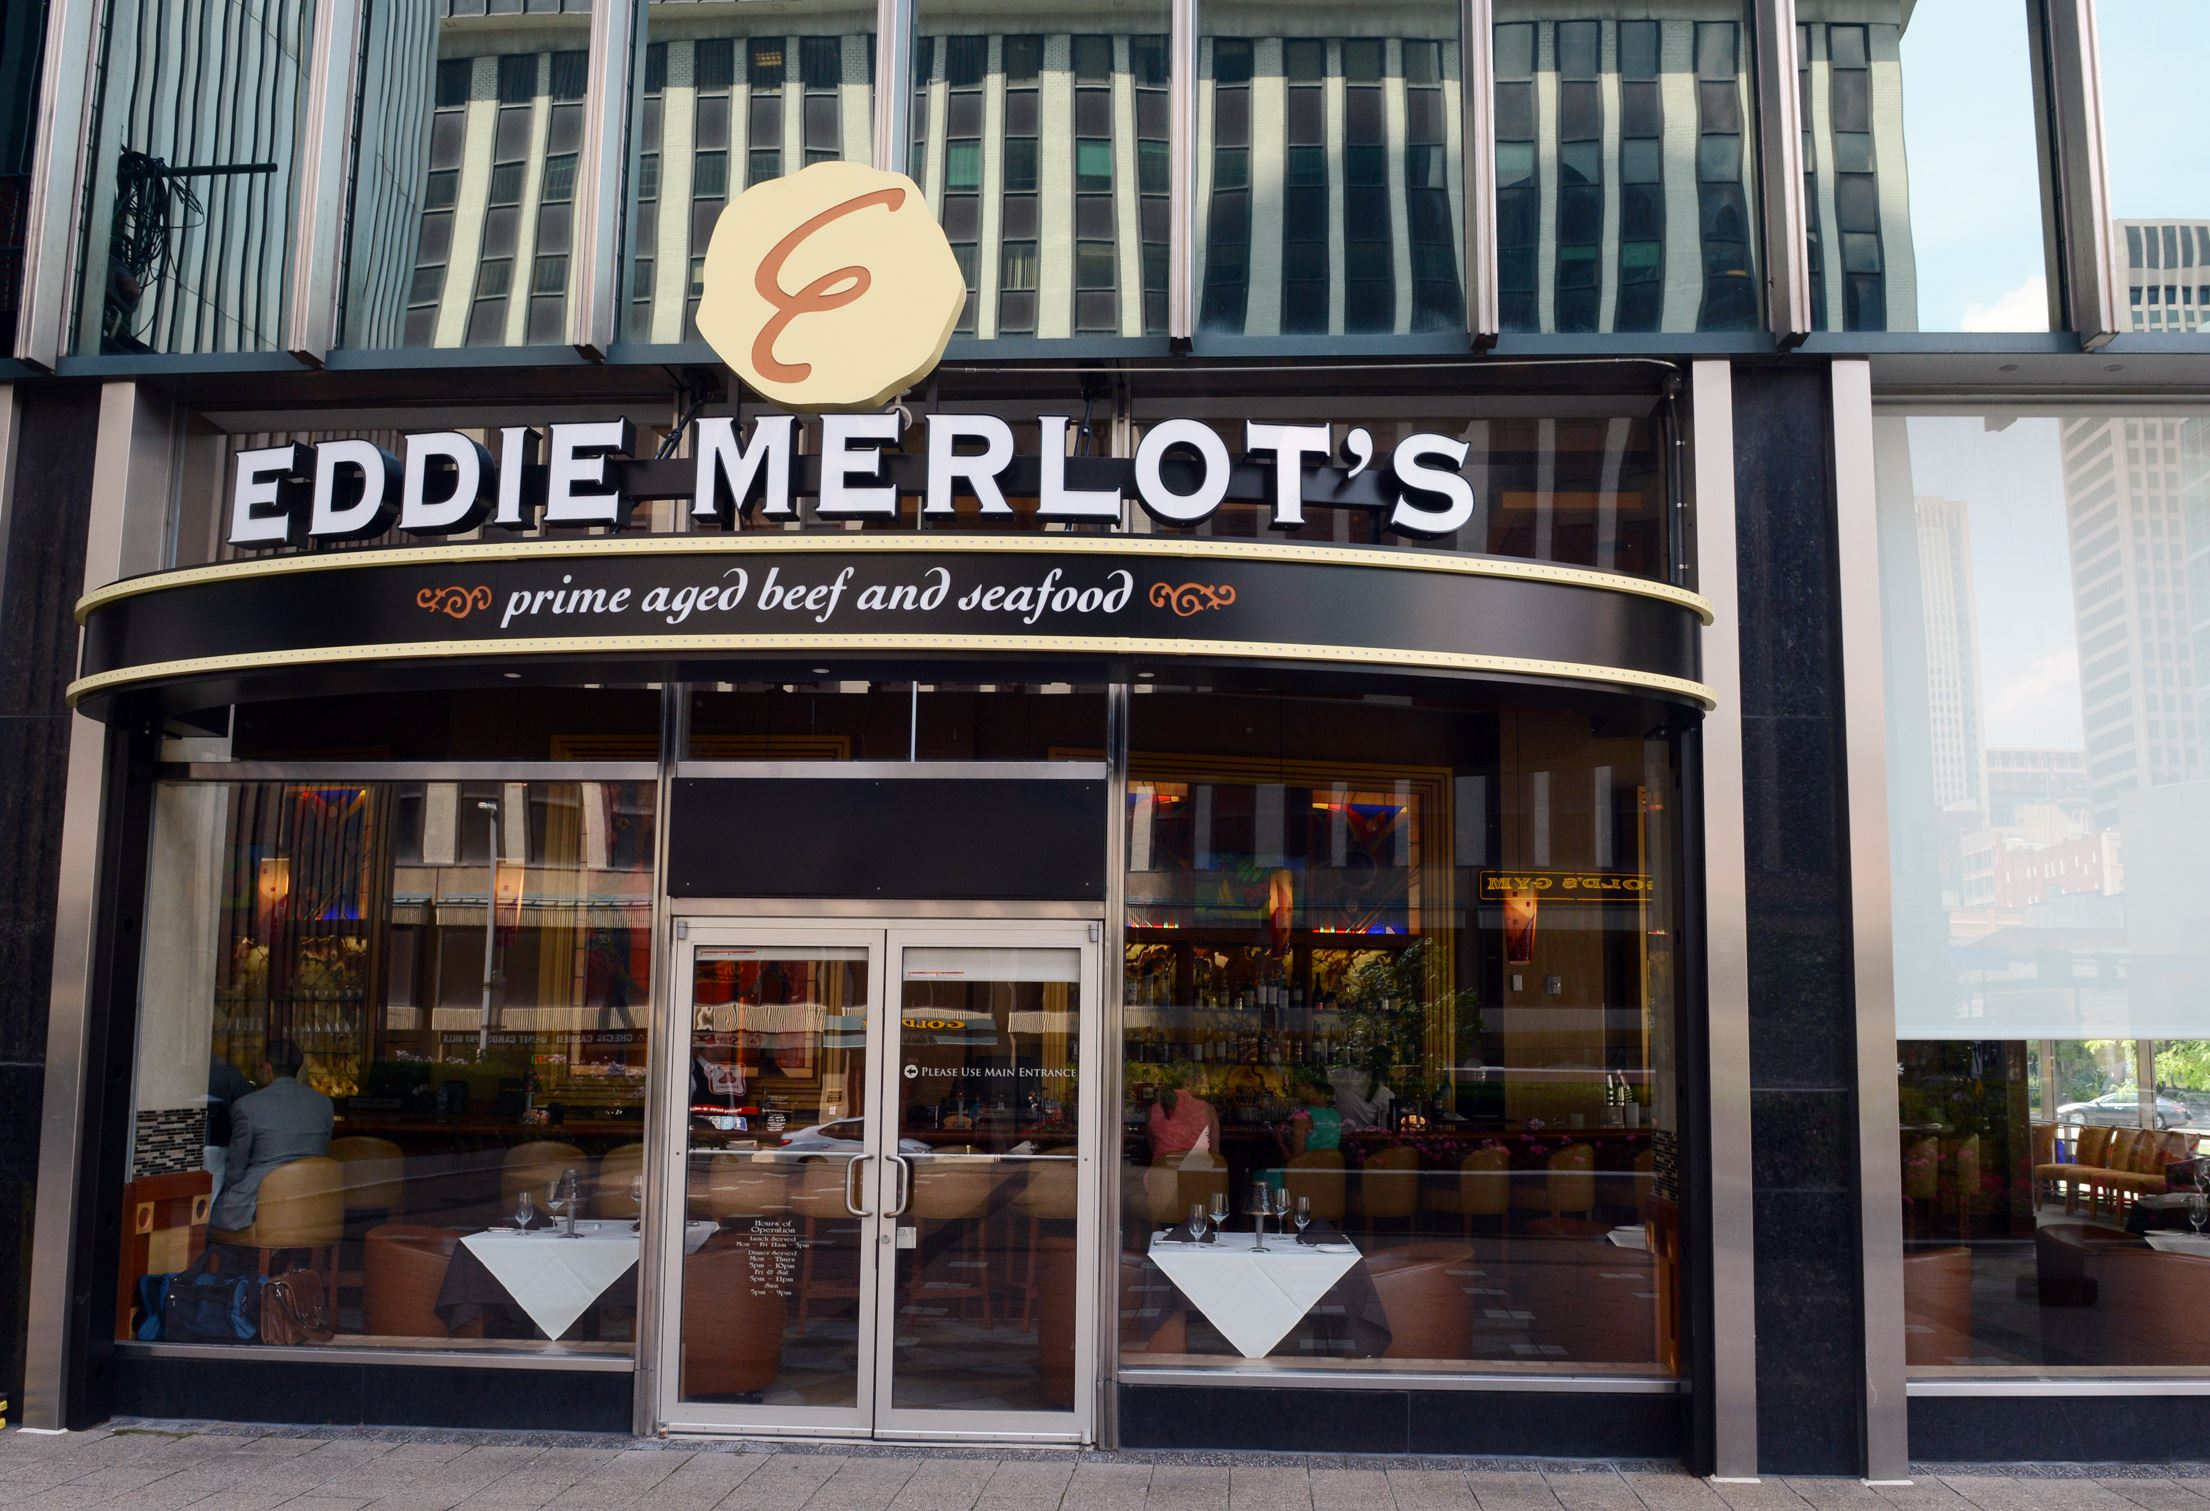 20140617bwEddieMag04-3 Eddie Merlot's.